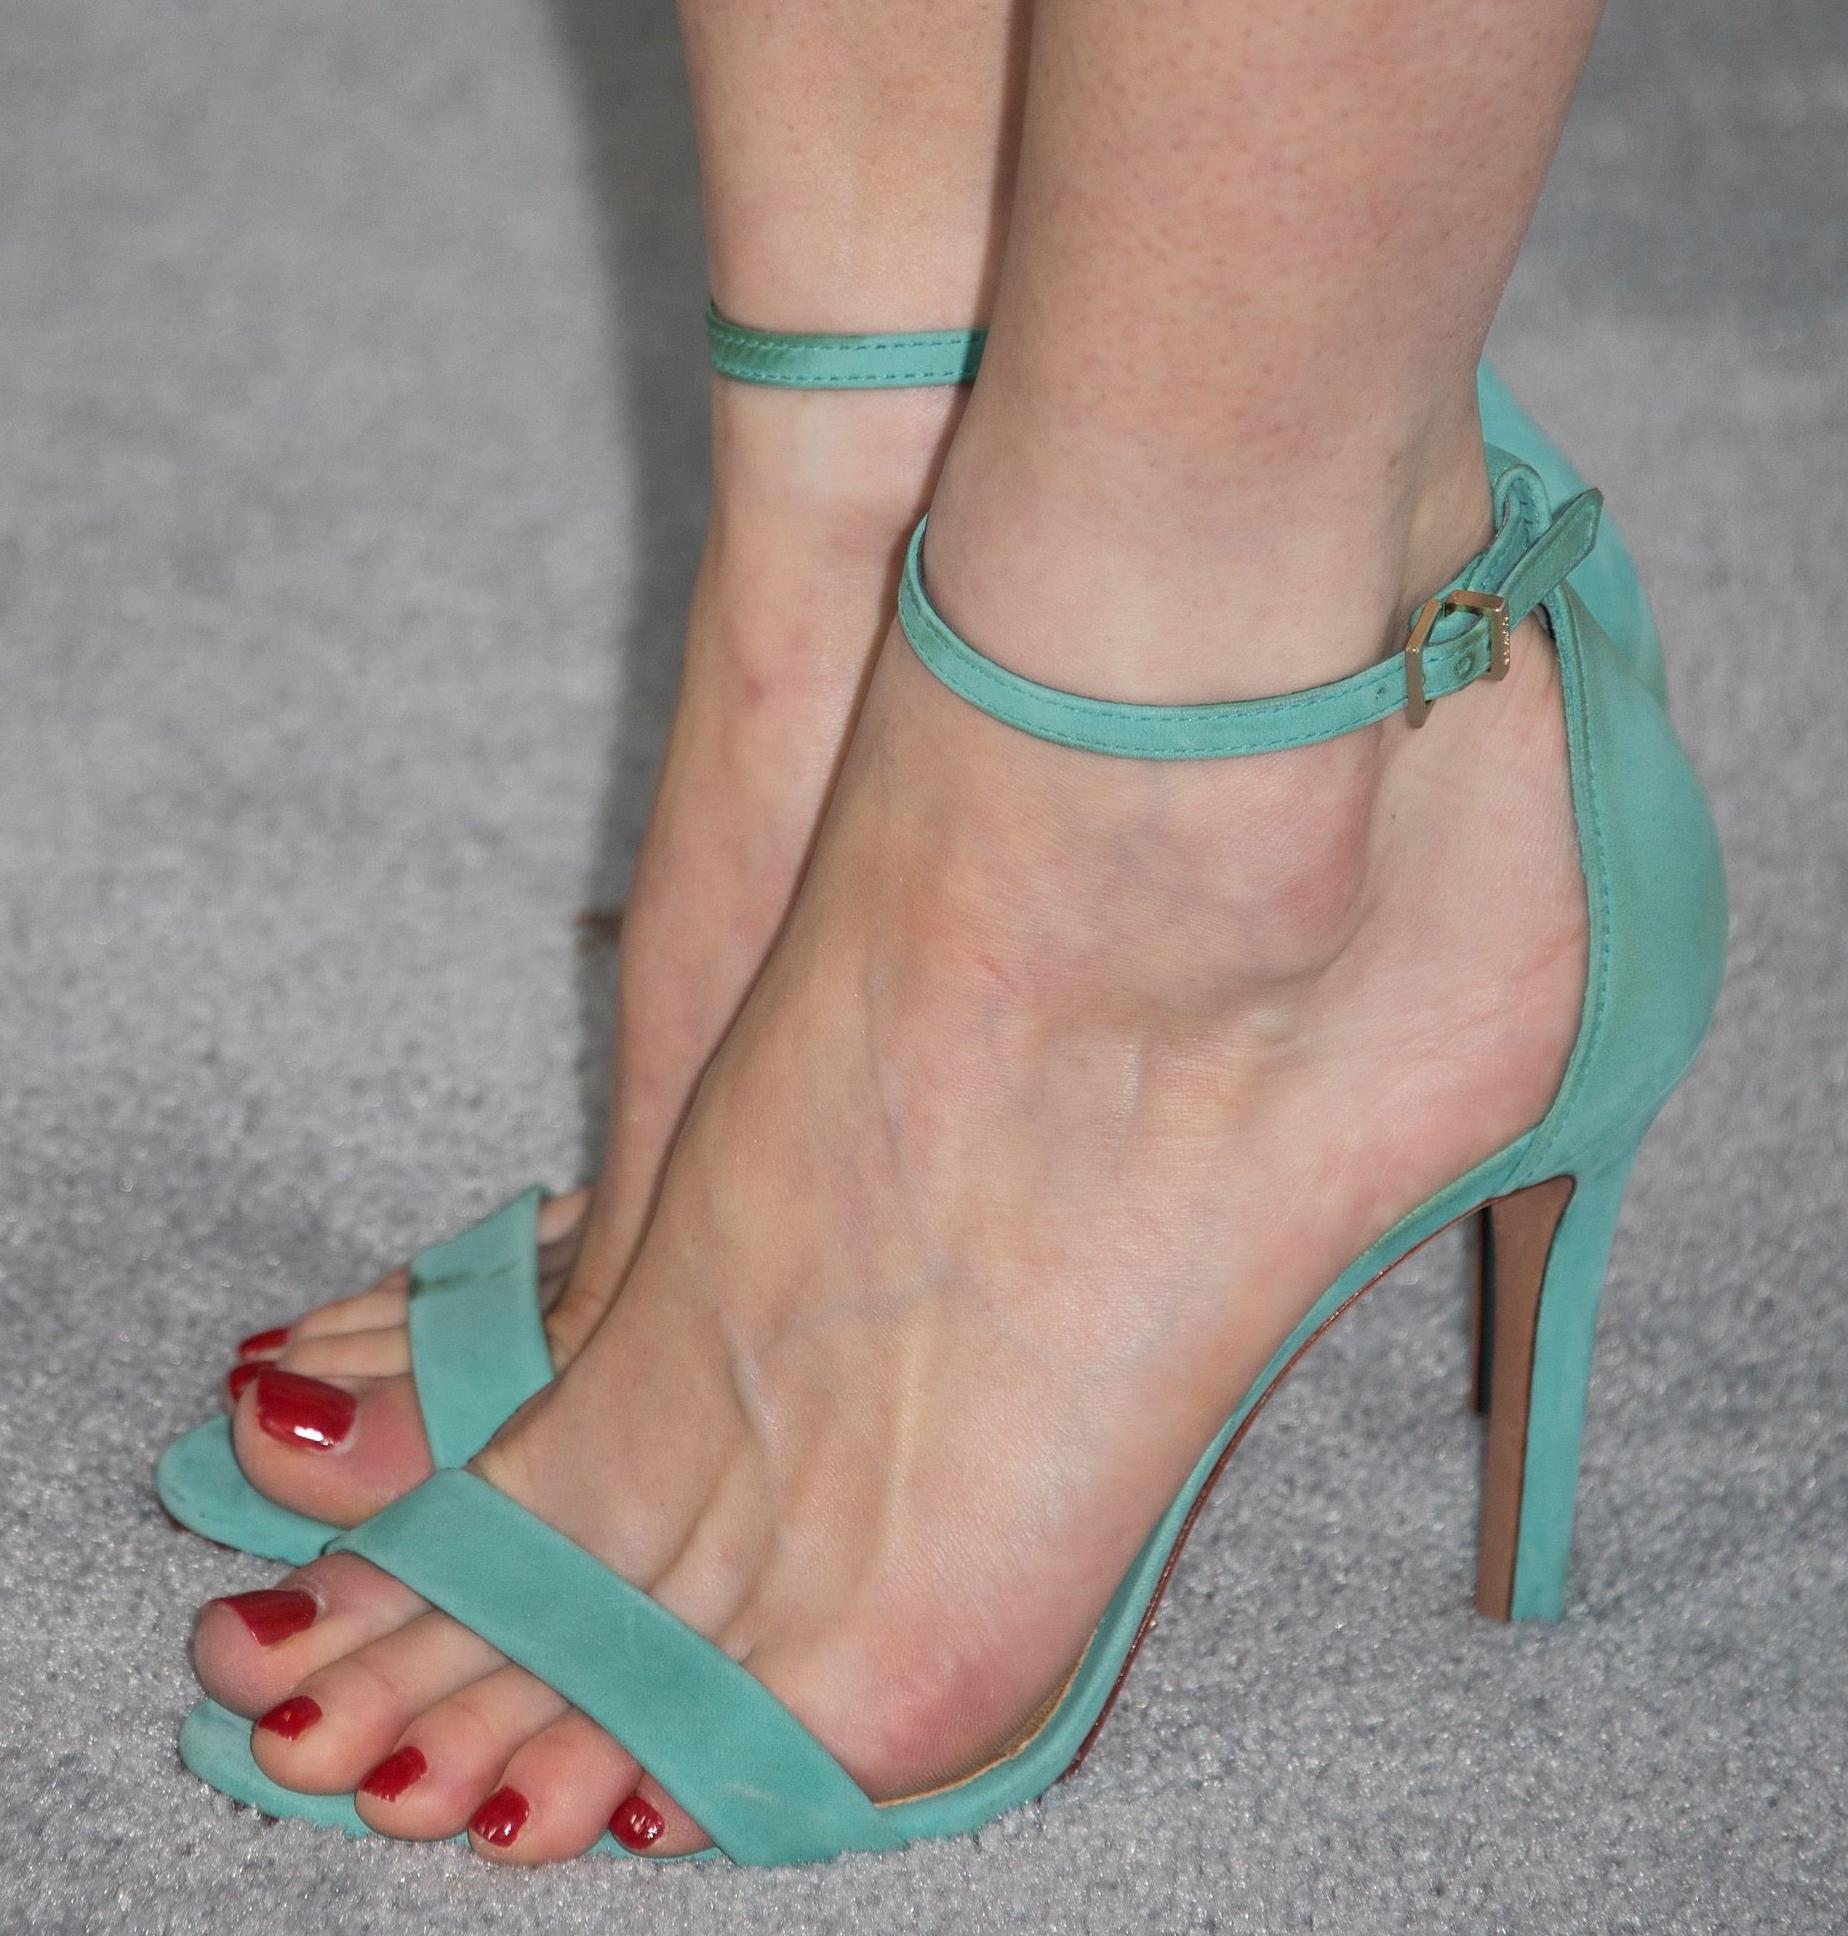 Feet Alexis Bledel nudes (72 photo), Twitter